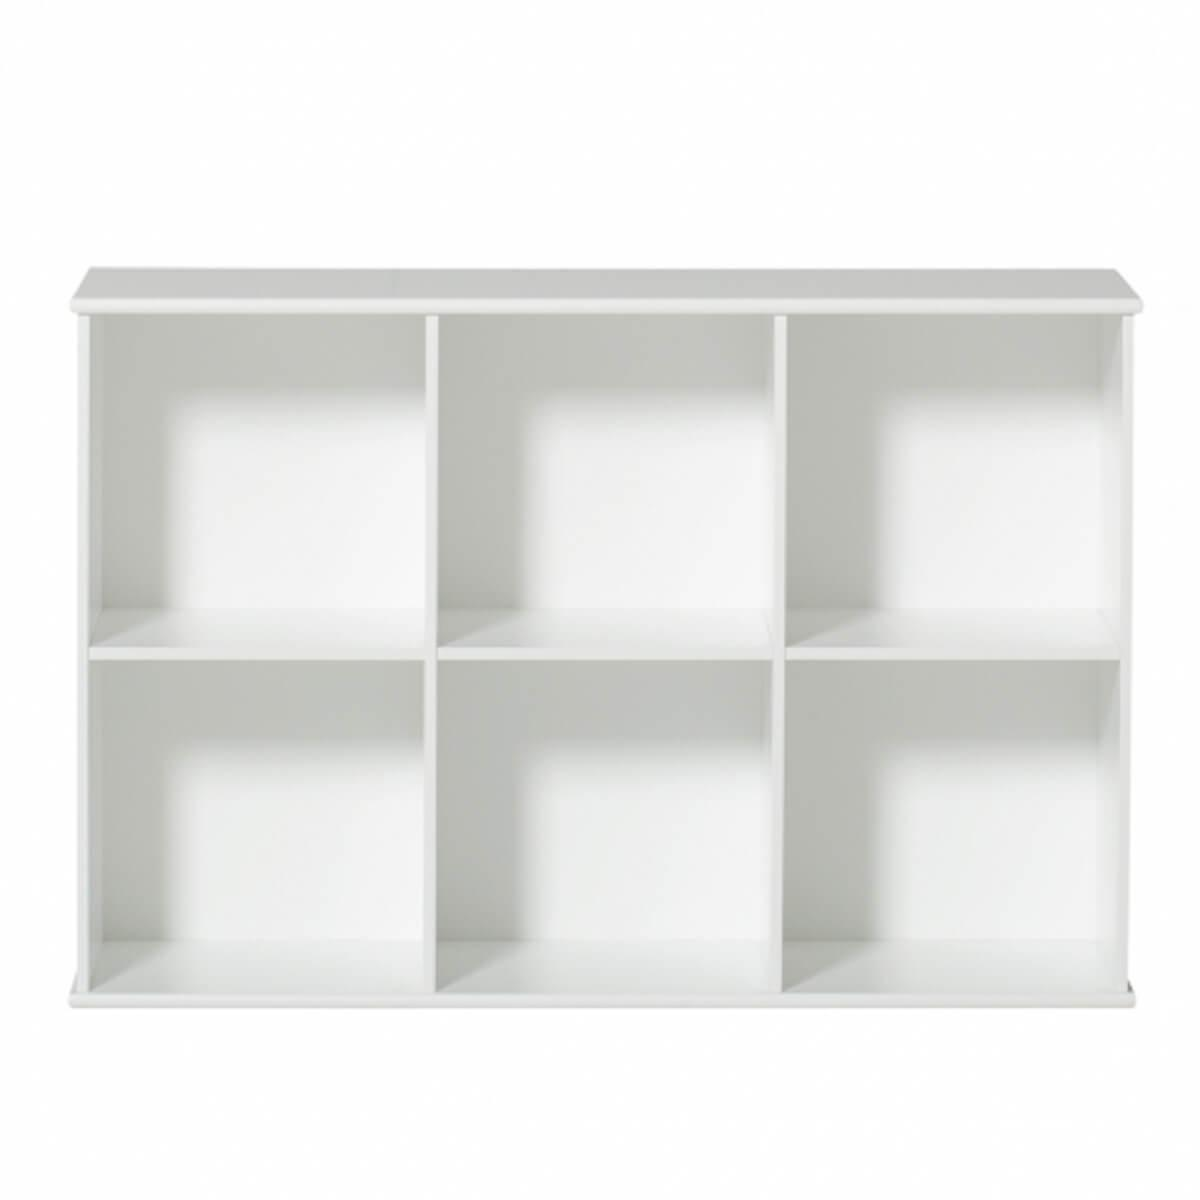 Estantería 106x78cm WOOD Oliver Furniture blanco